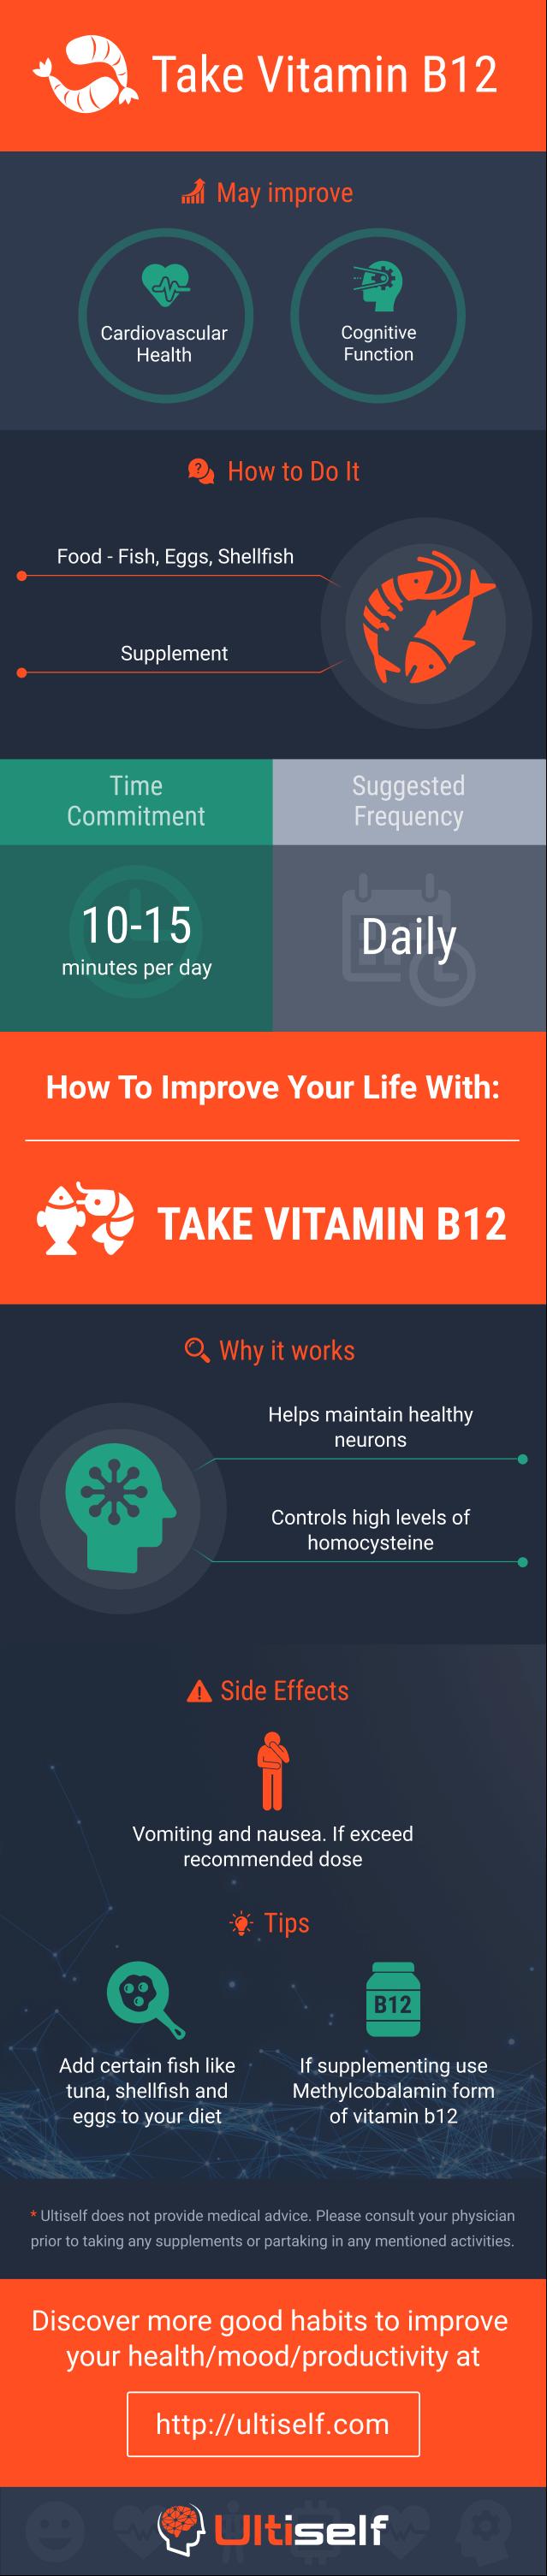 Vitamin B12 infographic